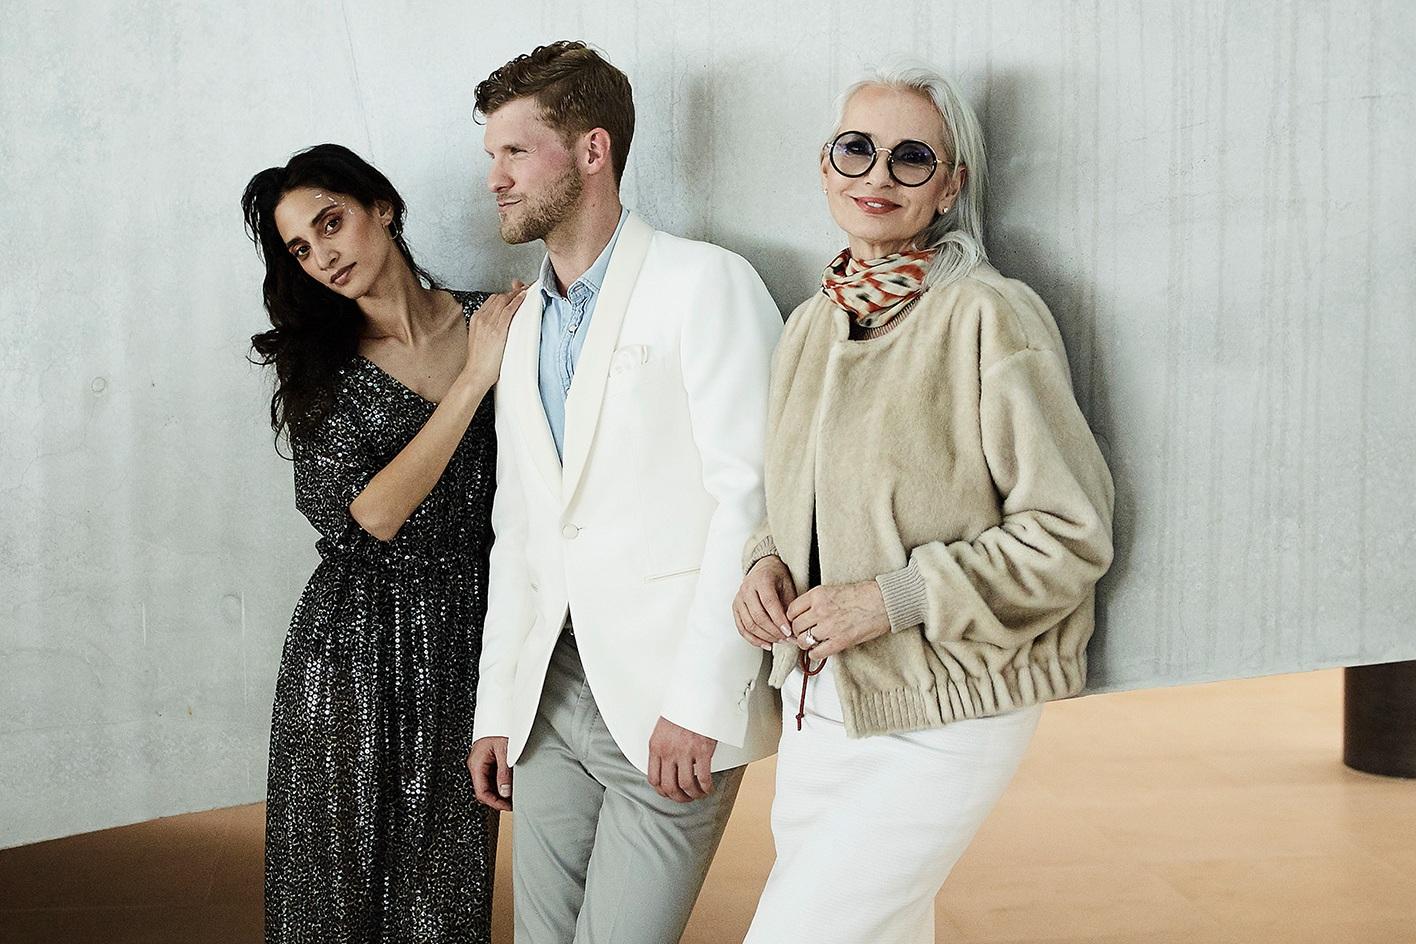 Lu+Couture+2019+Hires+CF601361.jpg